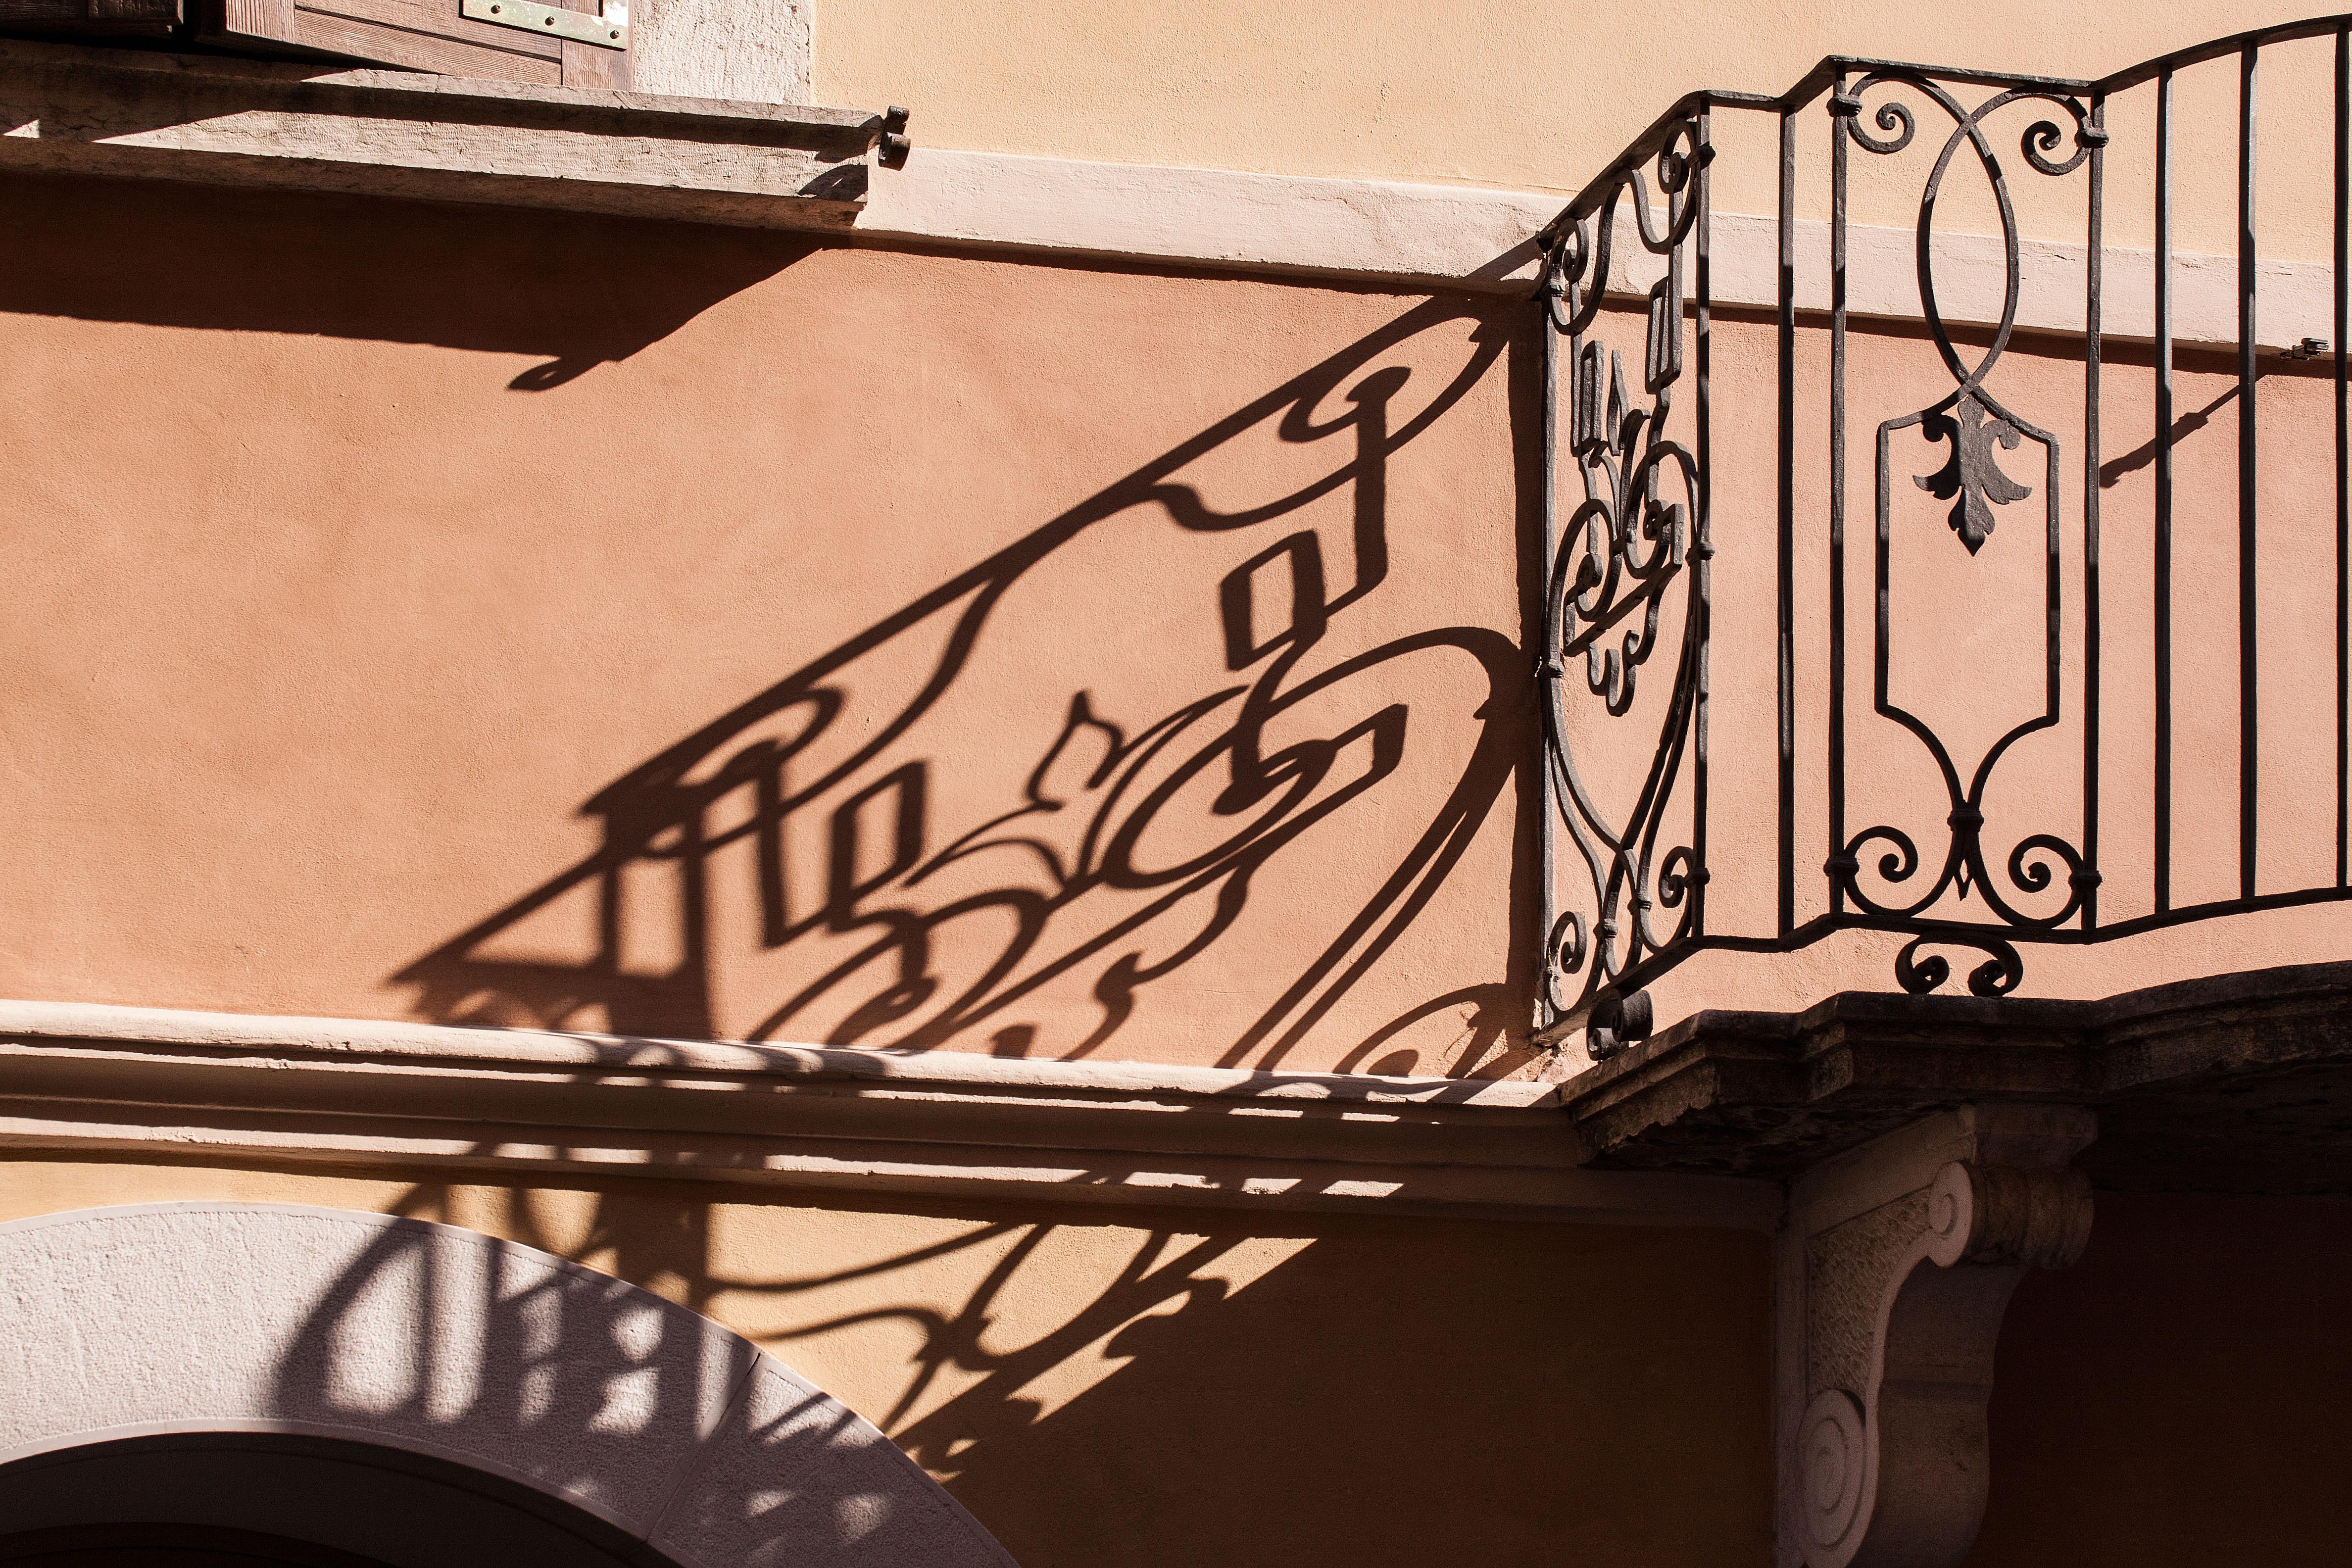 Fotos Gratis Arquitectura Madera Ventana Vaso Balc N  ~ Barandas De Hierro Para Escaleras Interiores